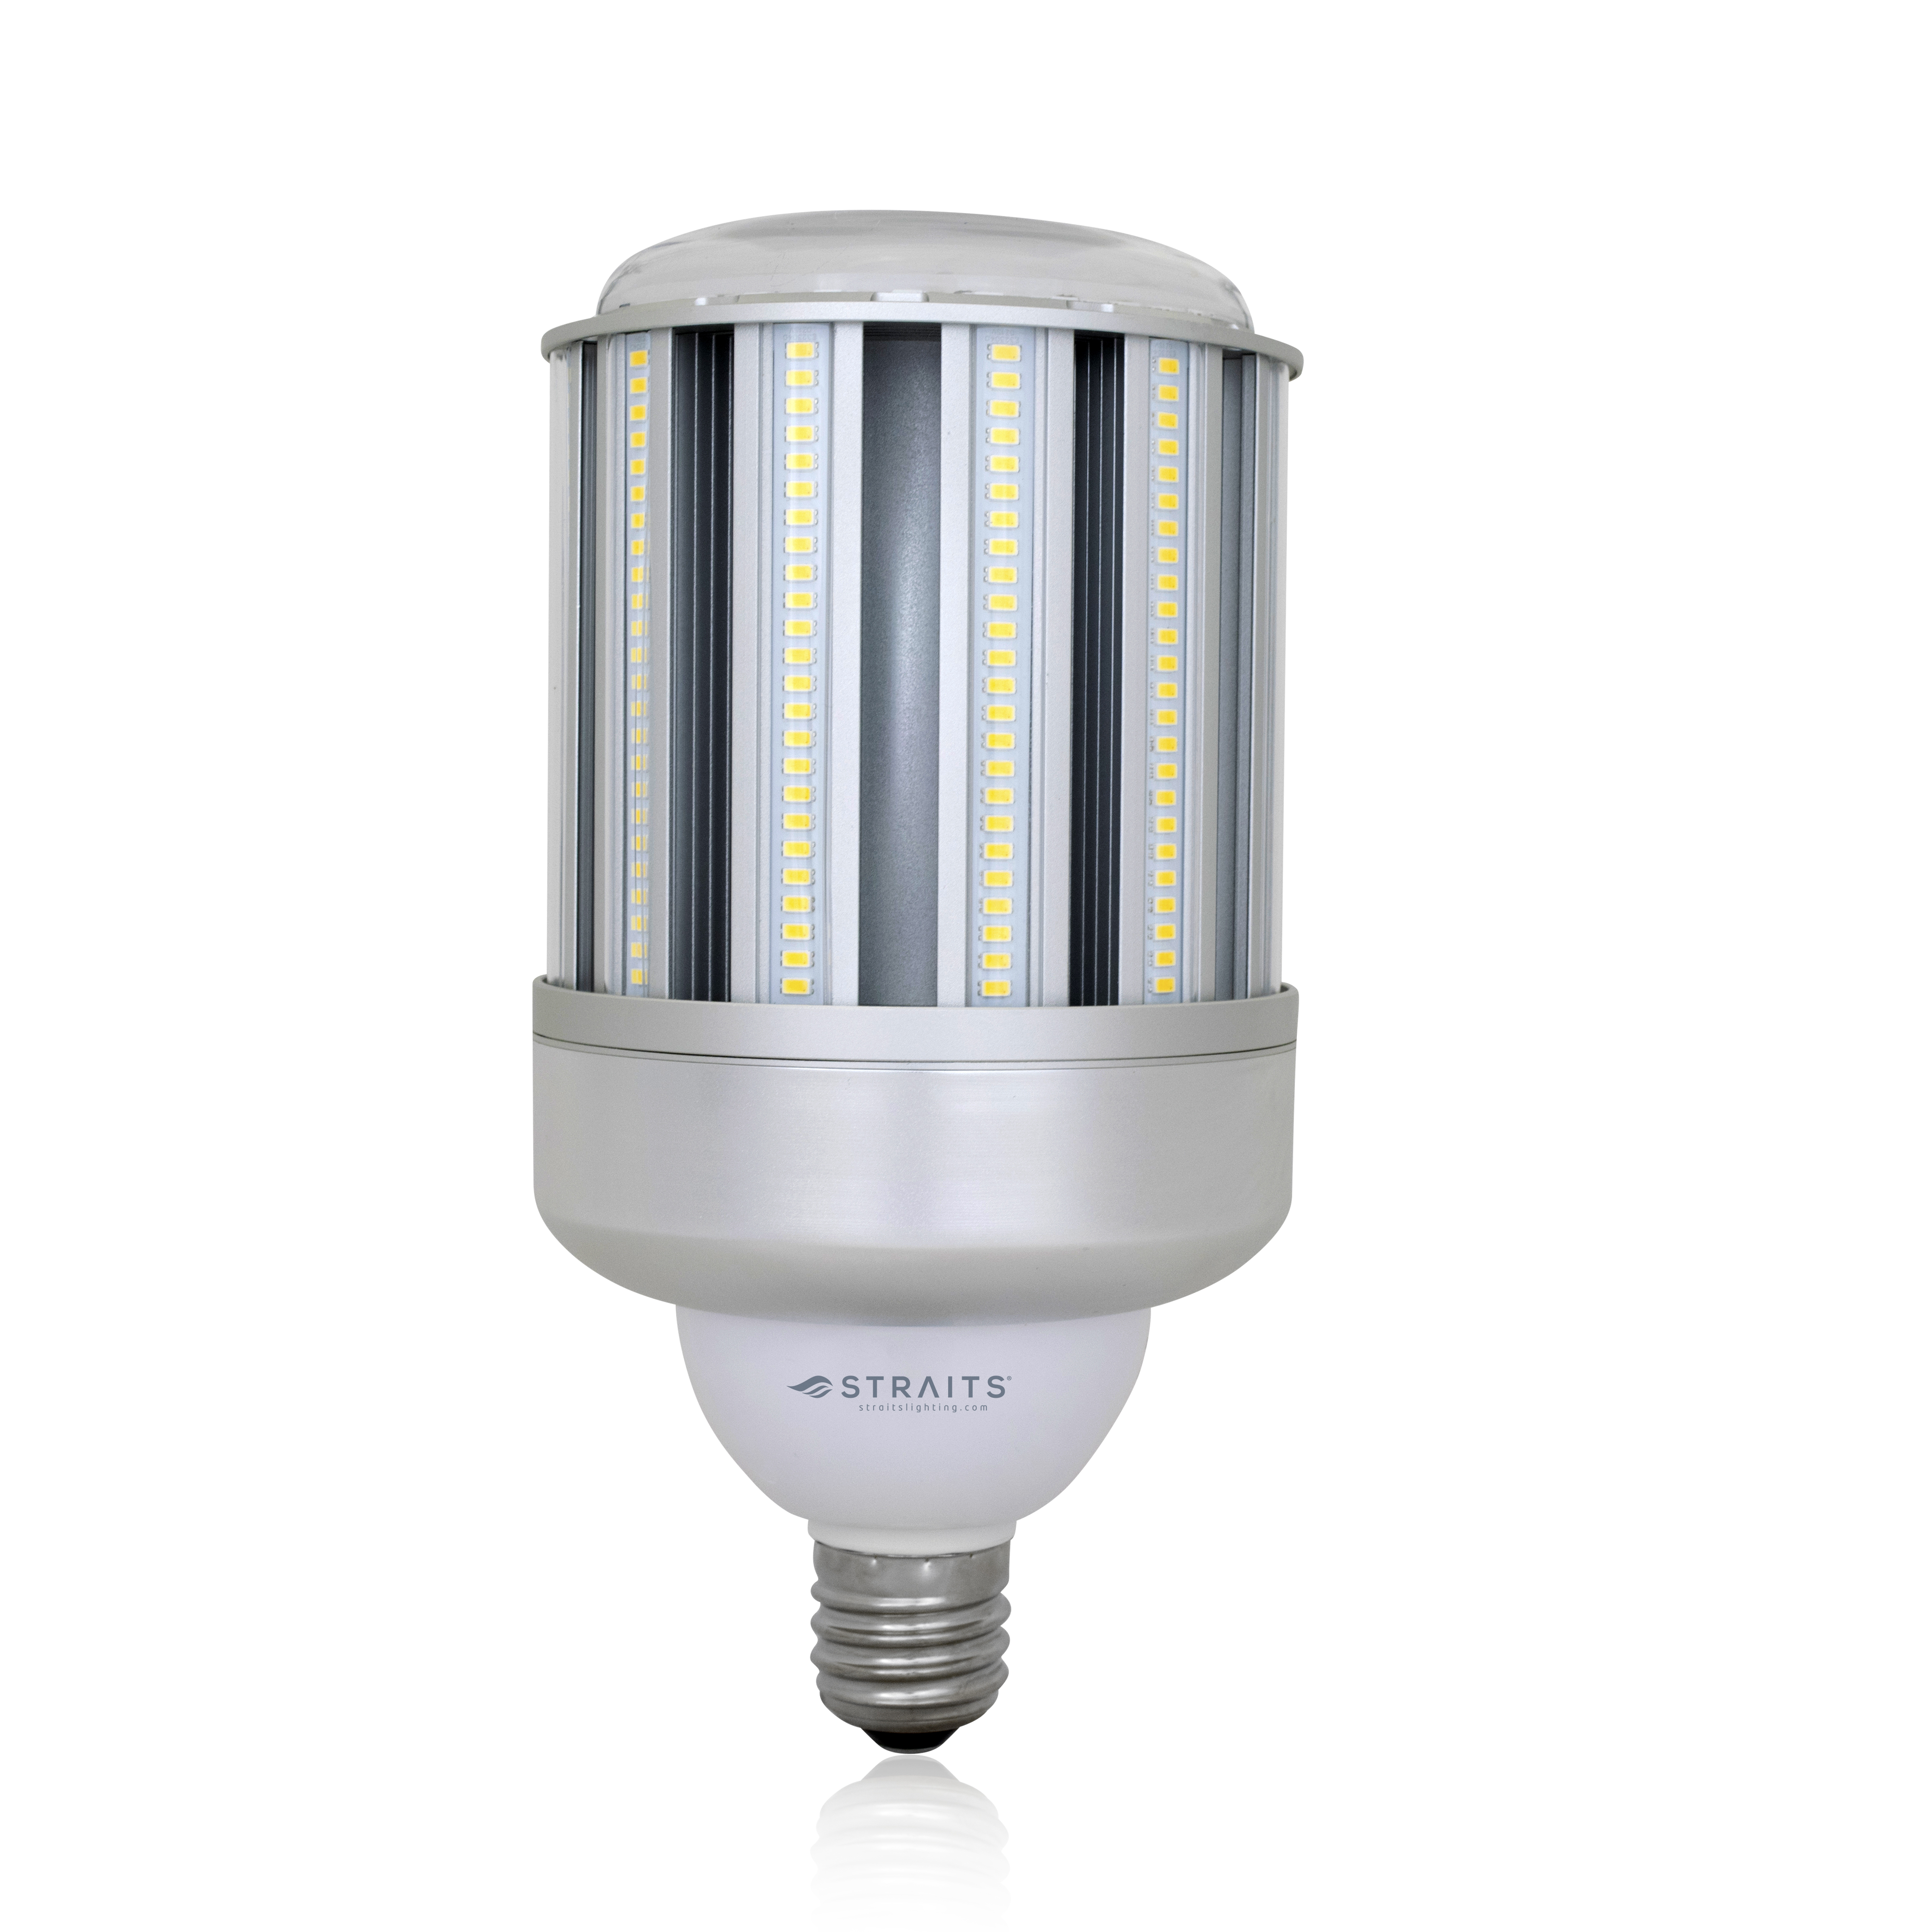 Beam 360 LED Corn Lamp - 15020067